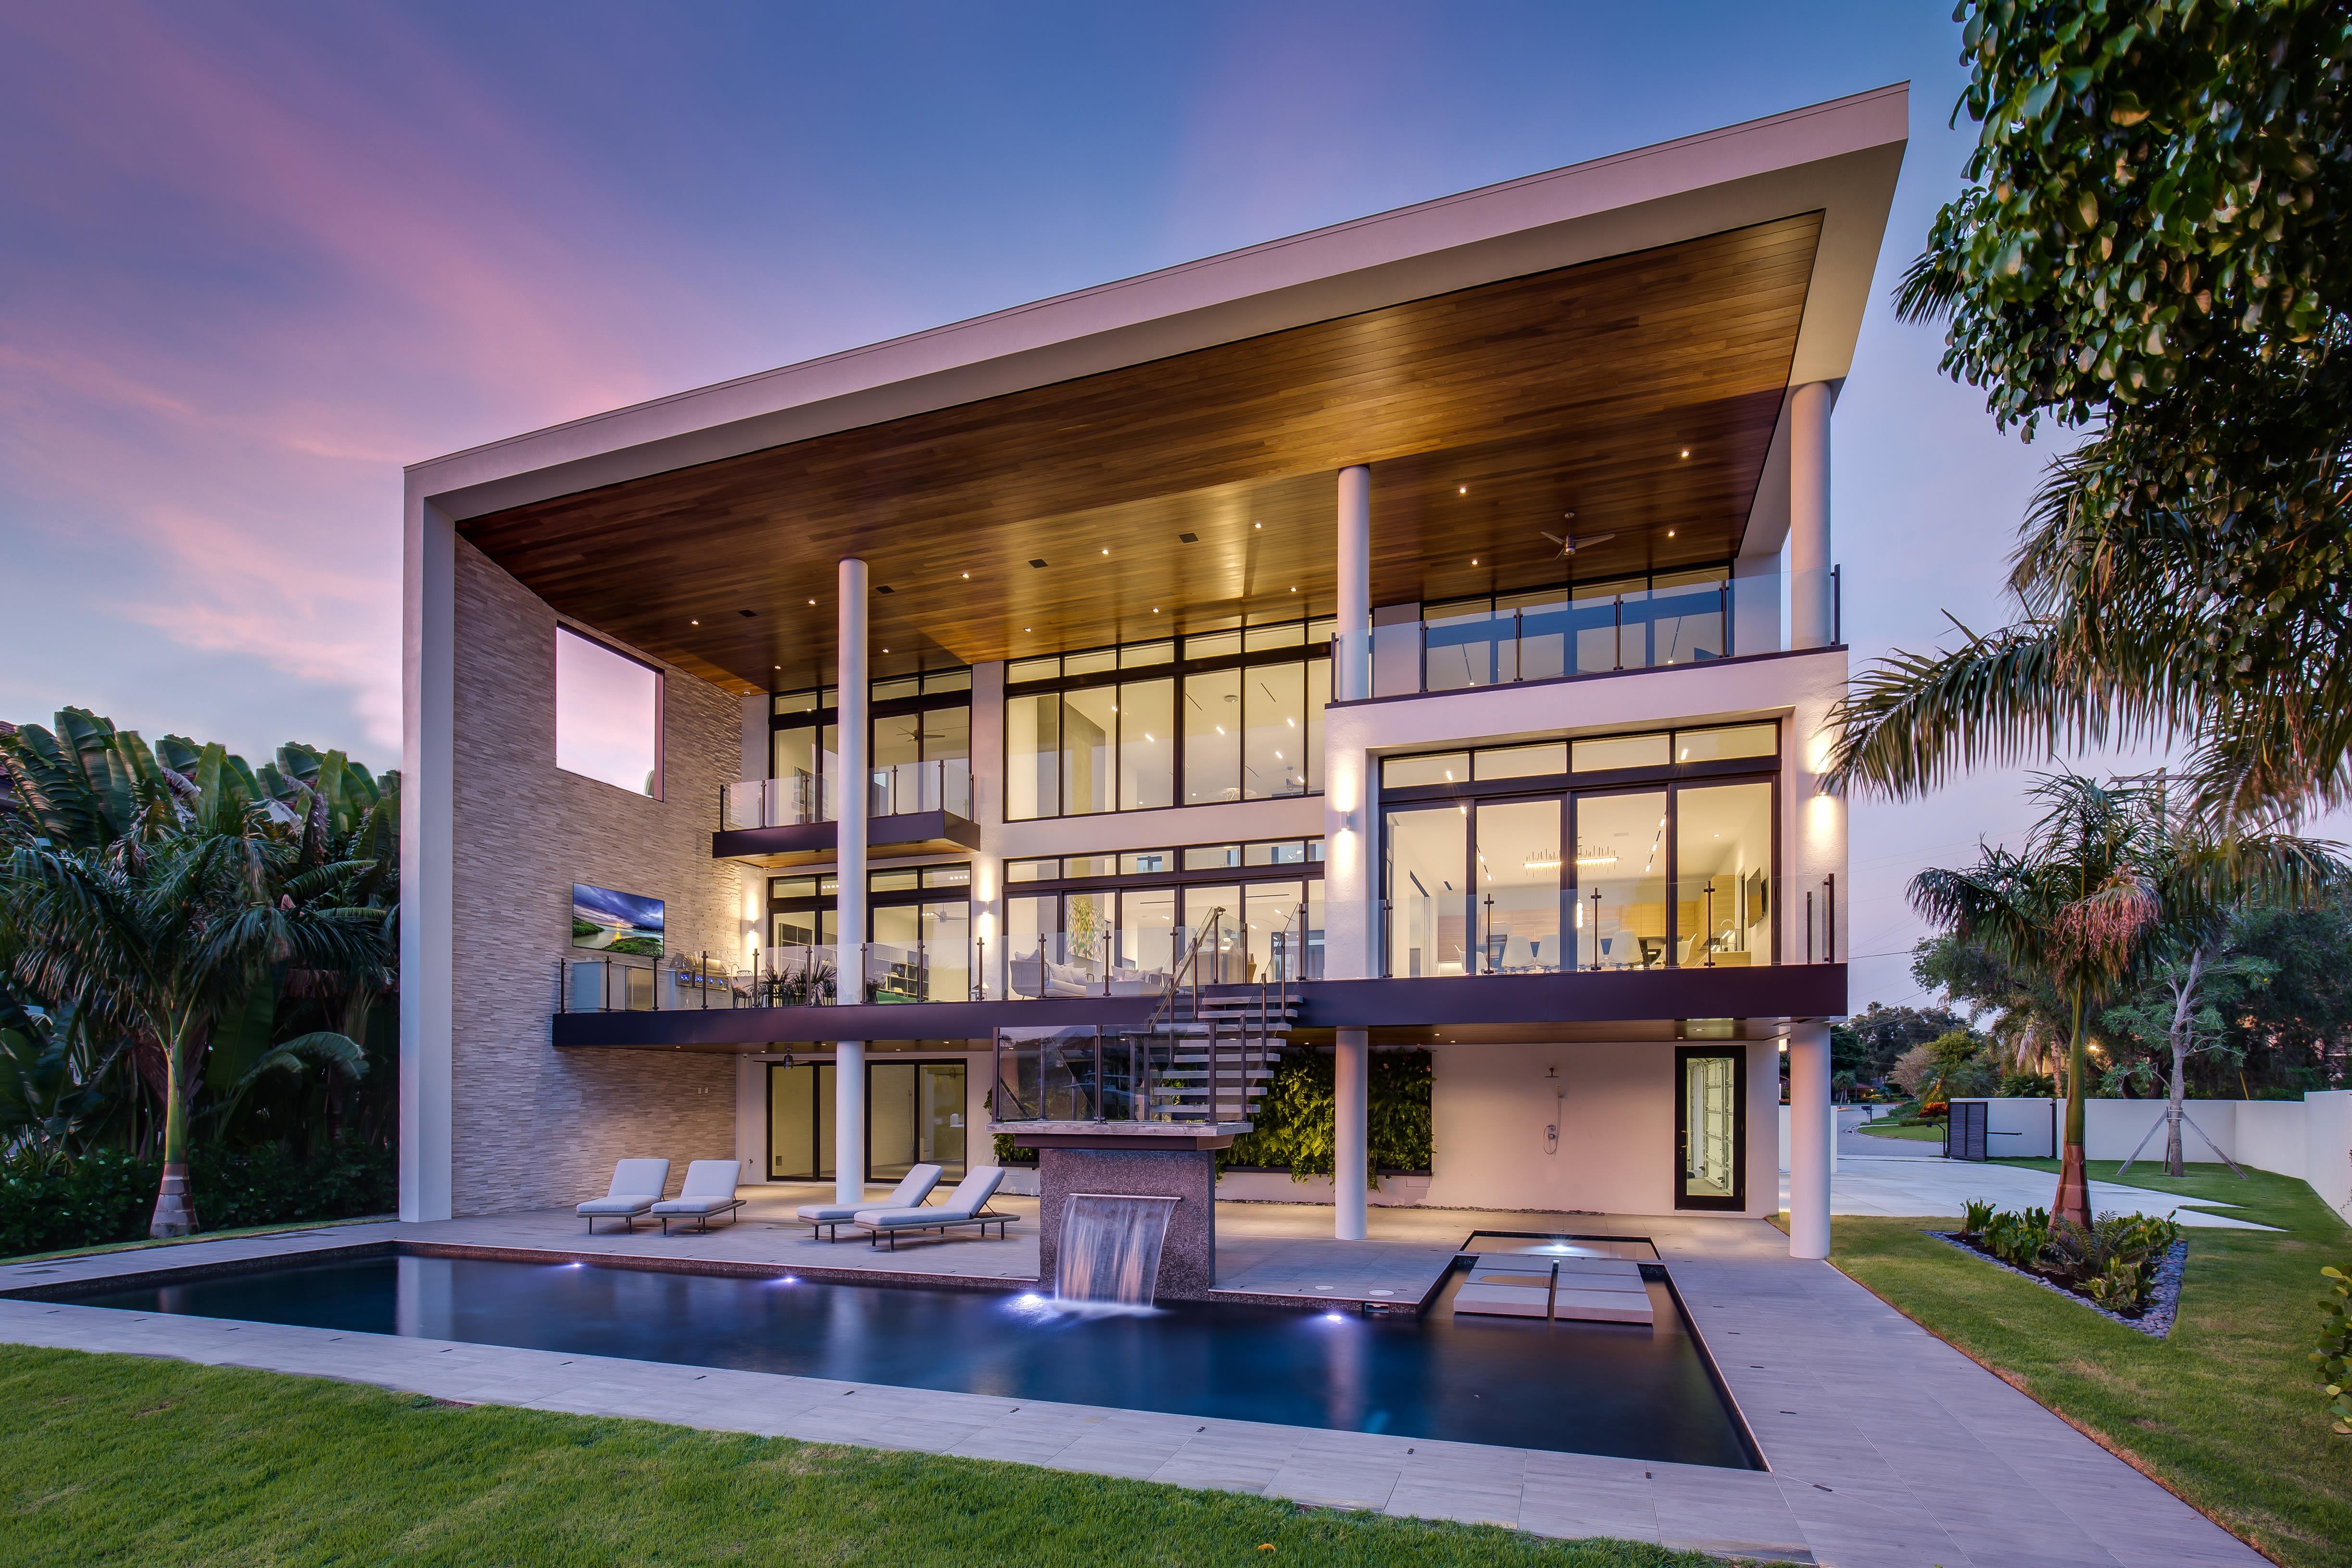 Wicked smart homes fxvrjd